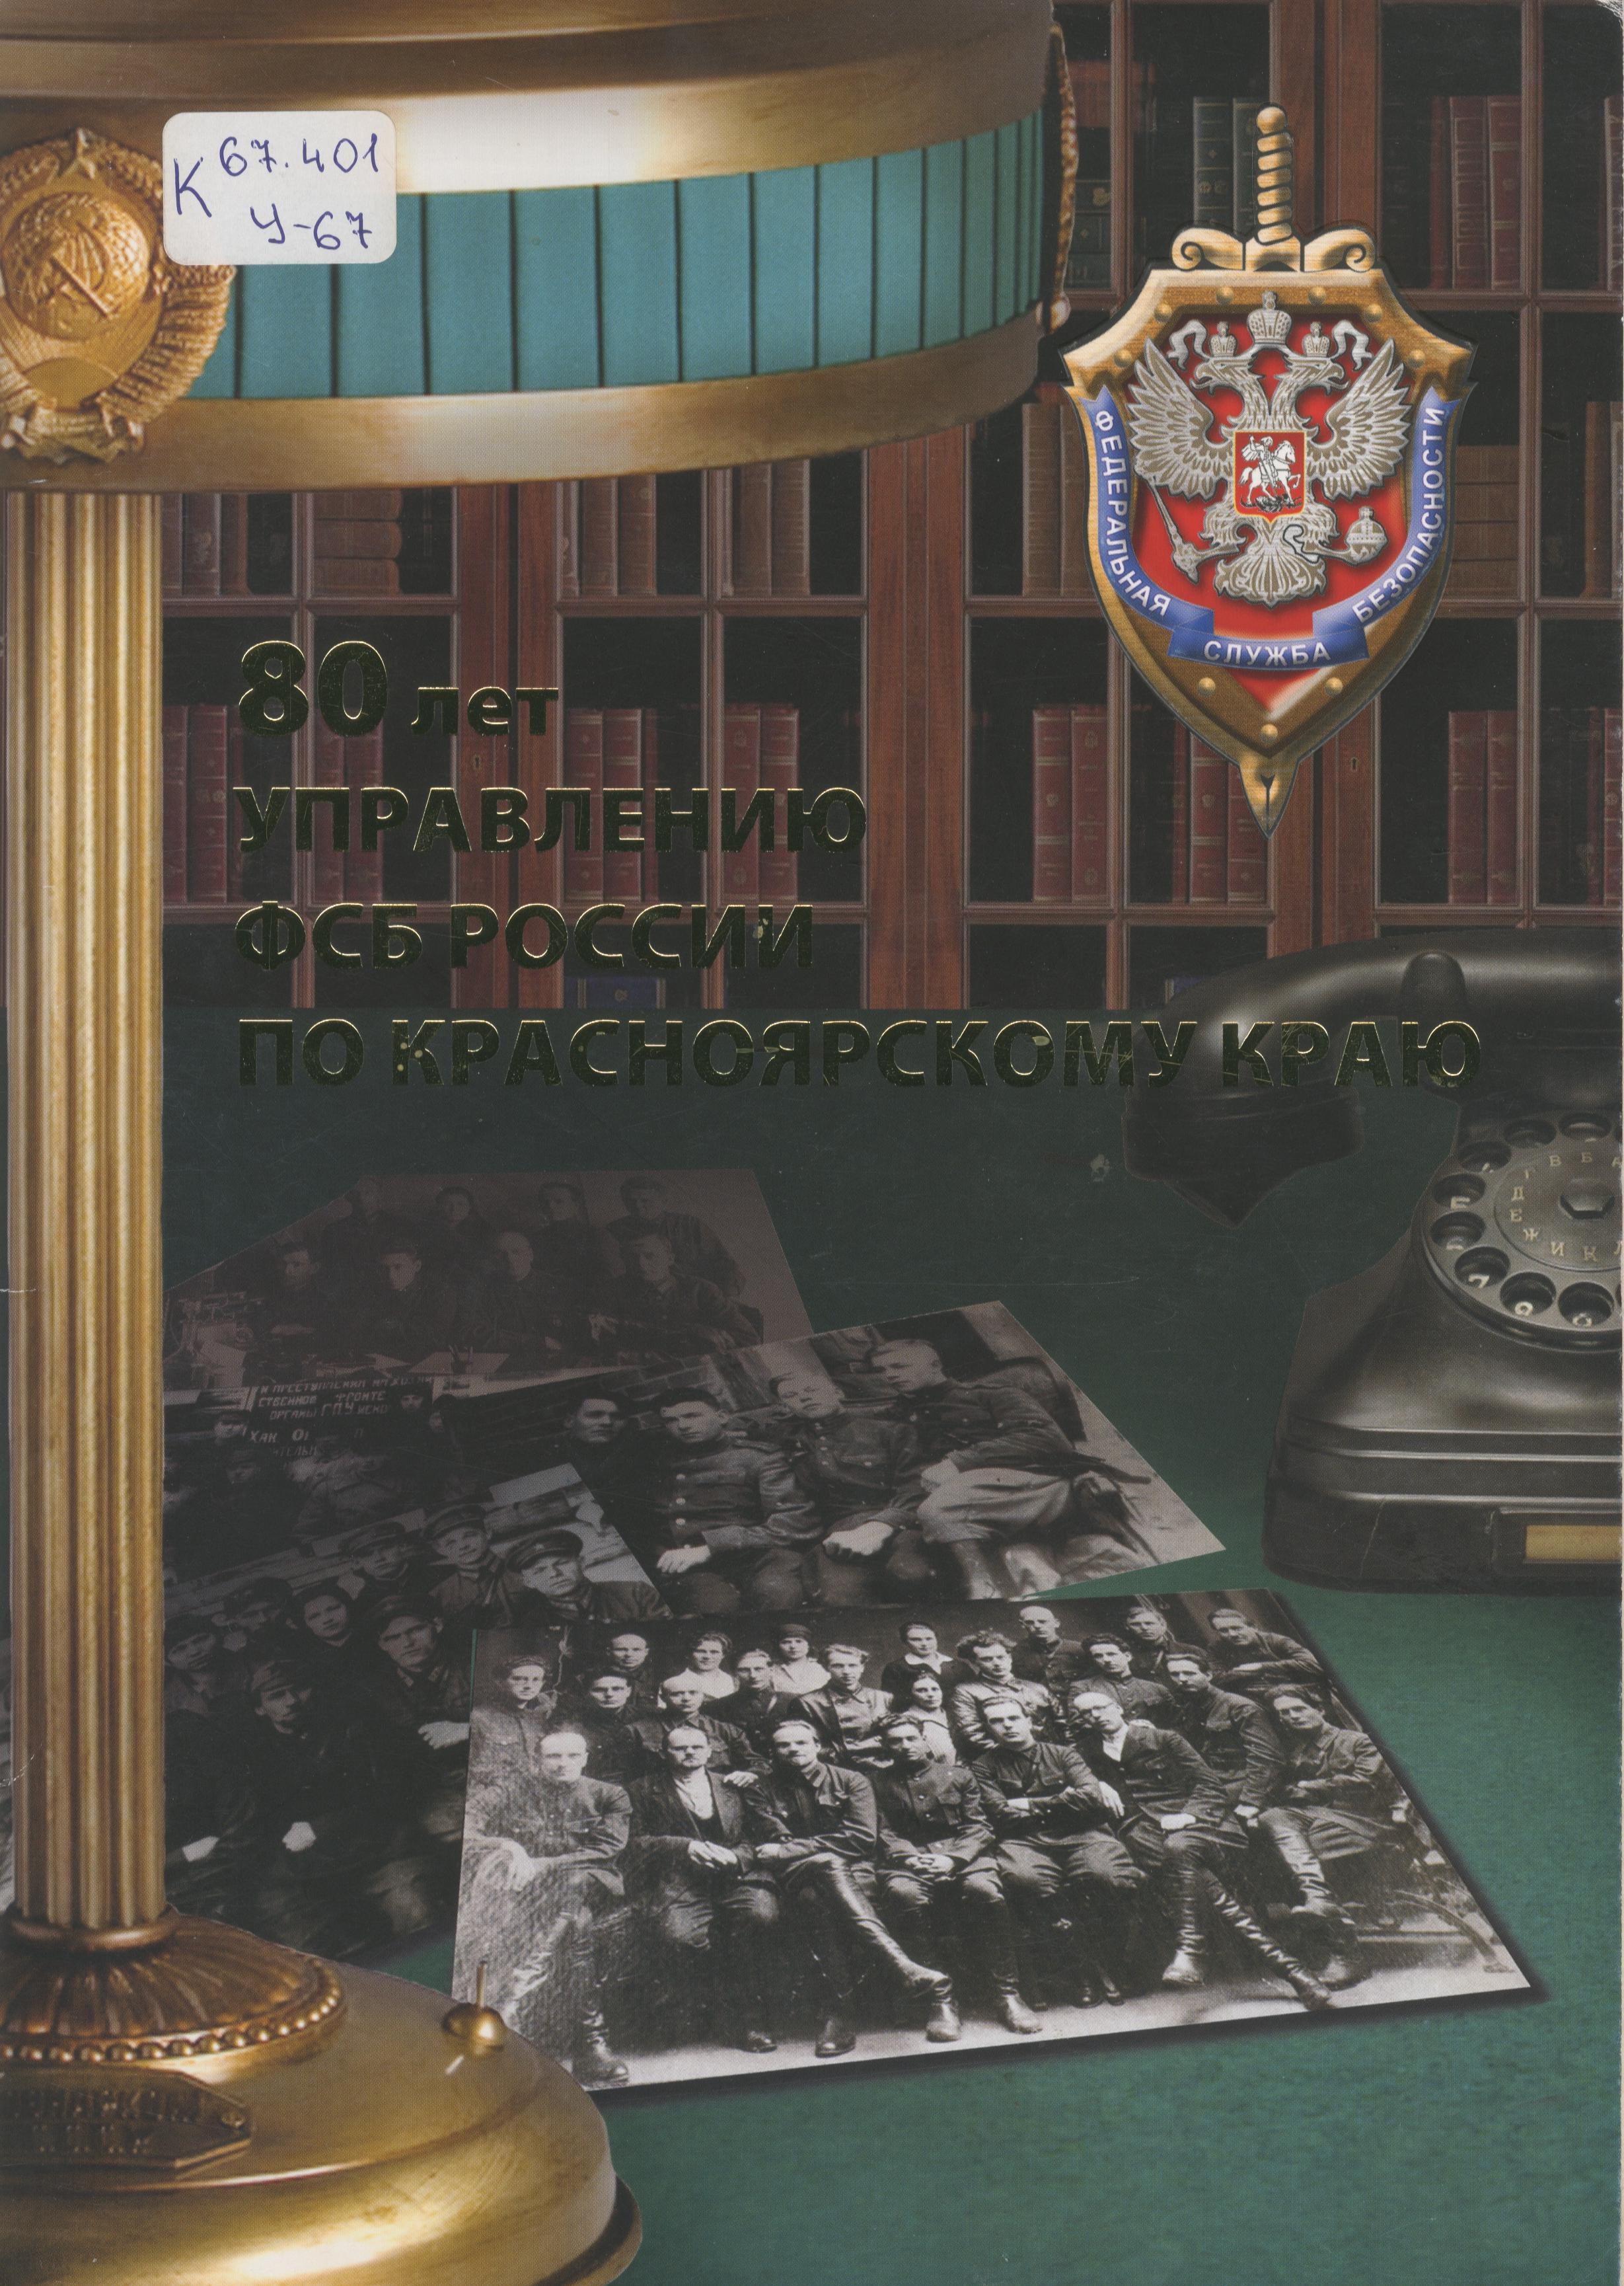 Решебник книга русский язык авторы е.а.быстрова о.м.александрова о.в.зеленова е стр 107 упр 238.е.семенова